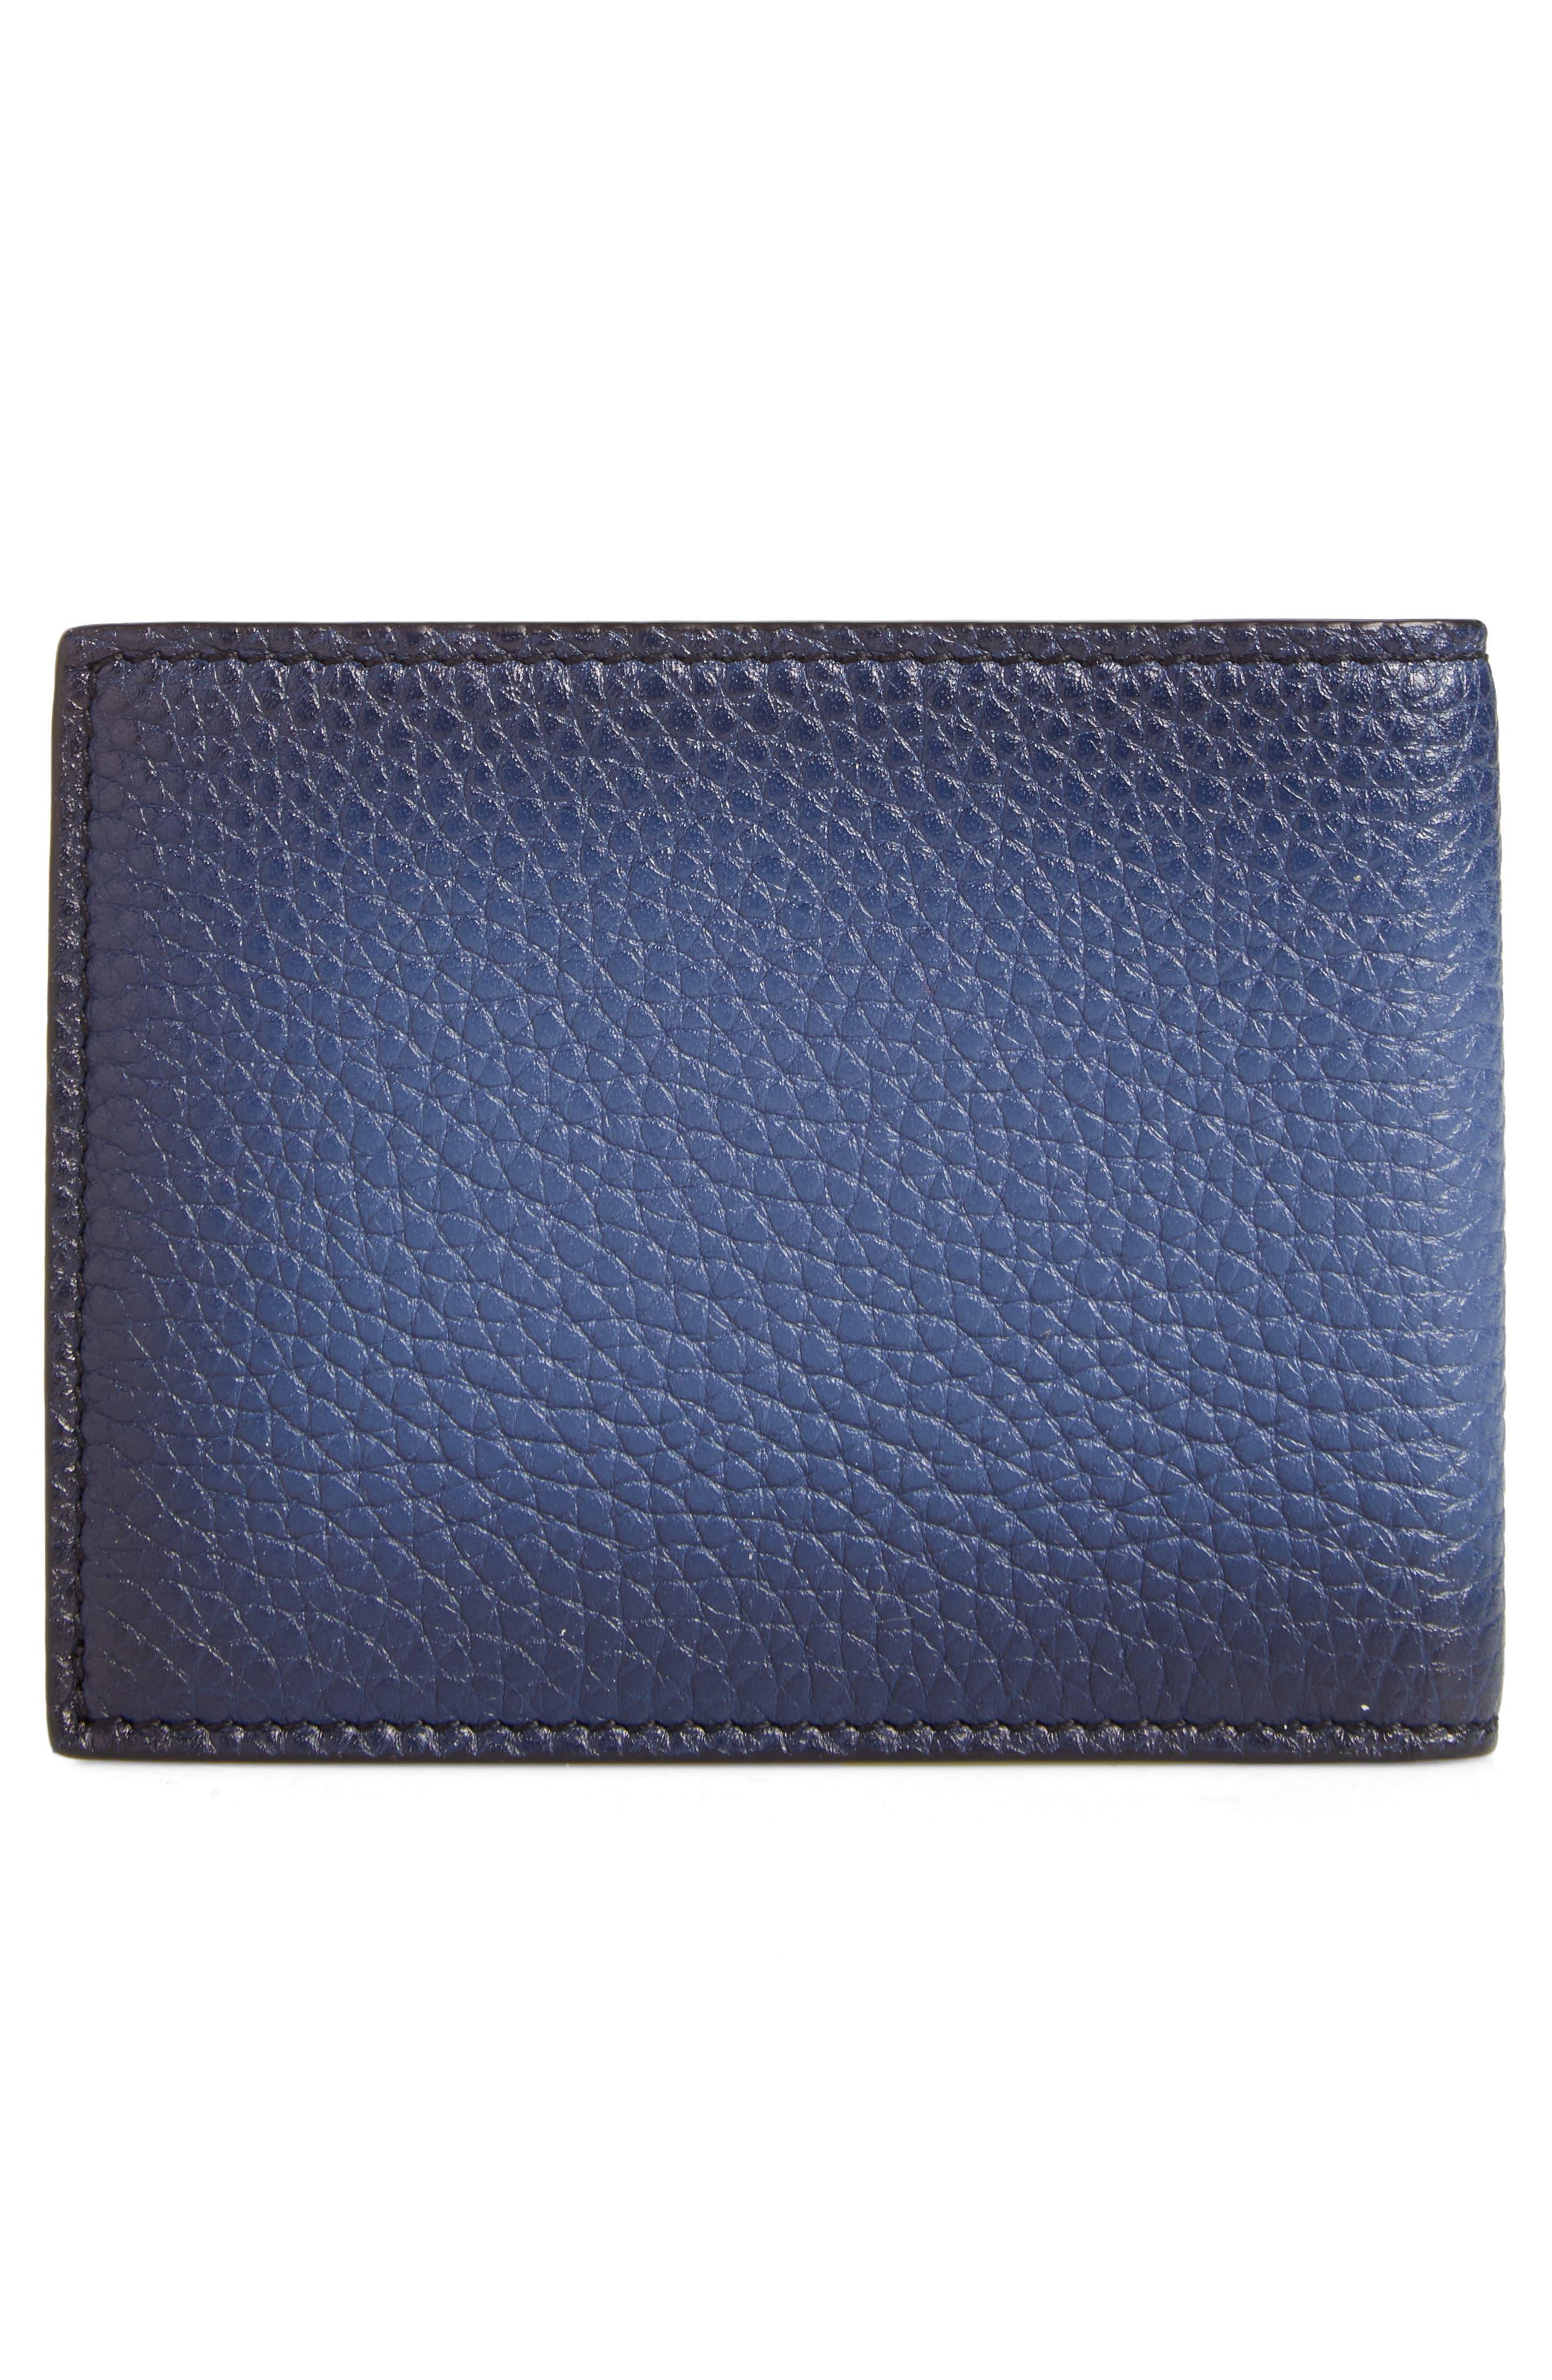 Firenze Glow Calfskin Leather Bifold Wallet,                             Alternate thumbnail 3, color,                             Blue